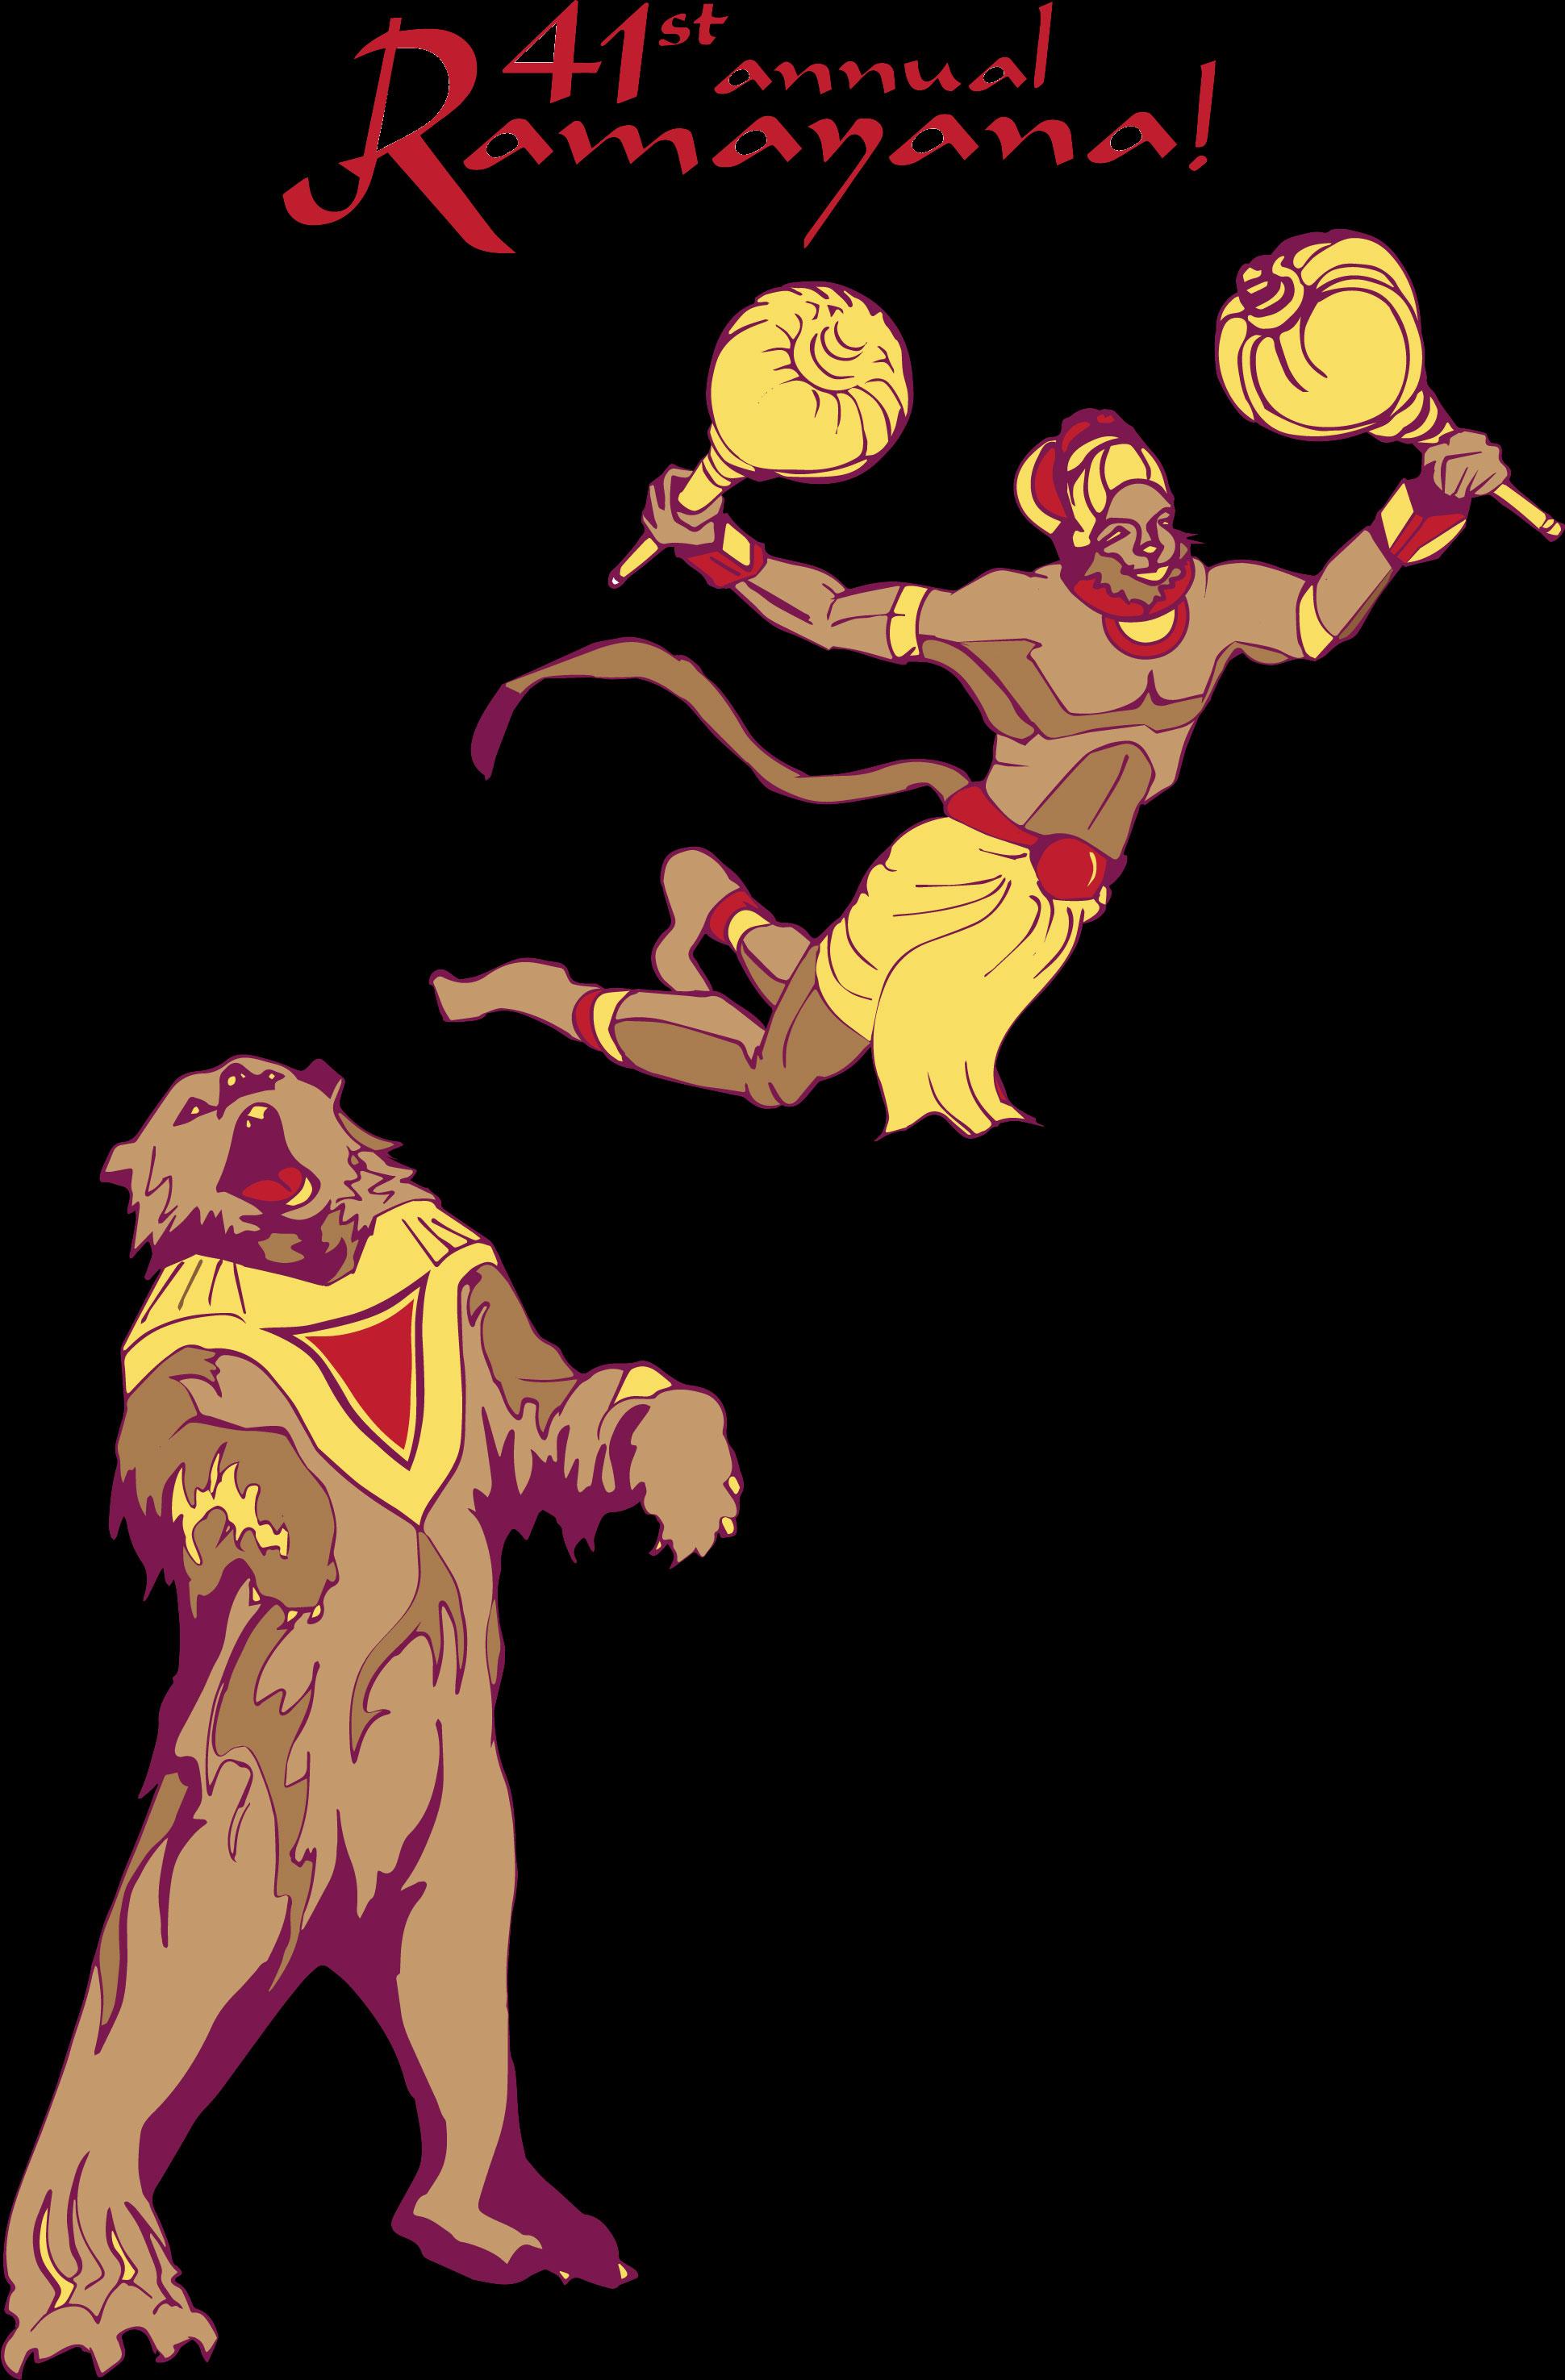 2019 <i>Ramayana!</i> T-Shirt